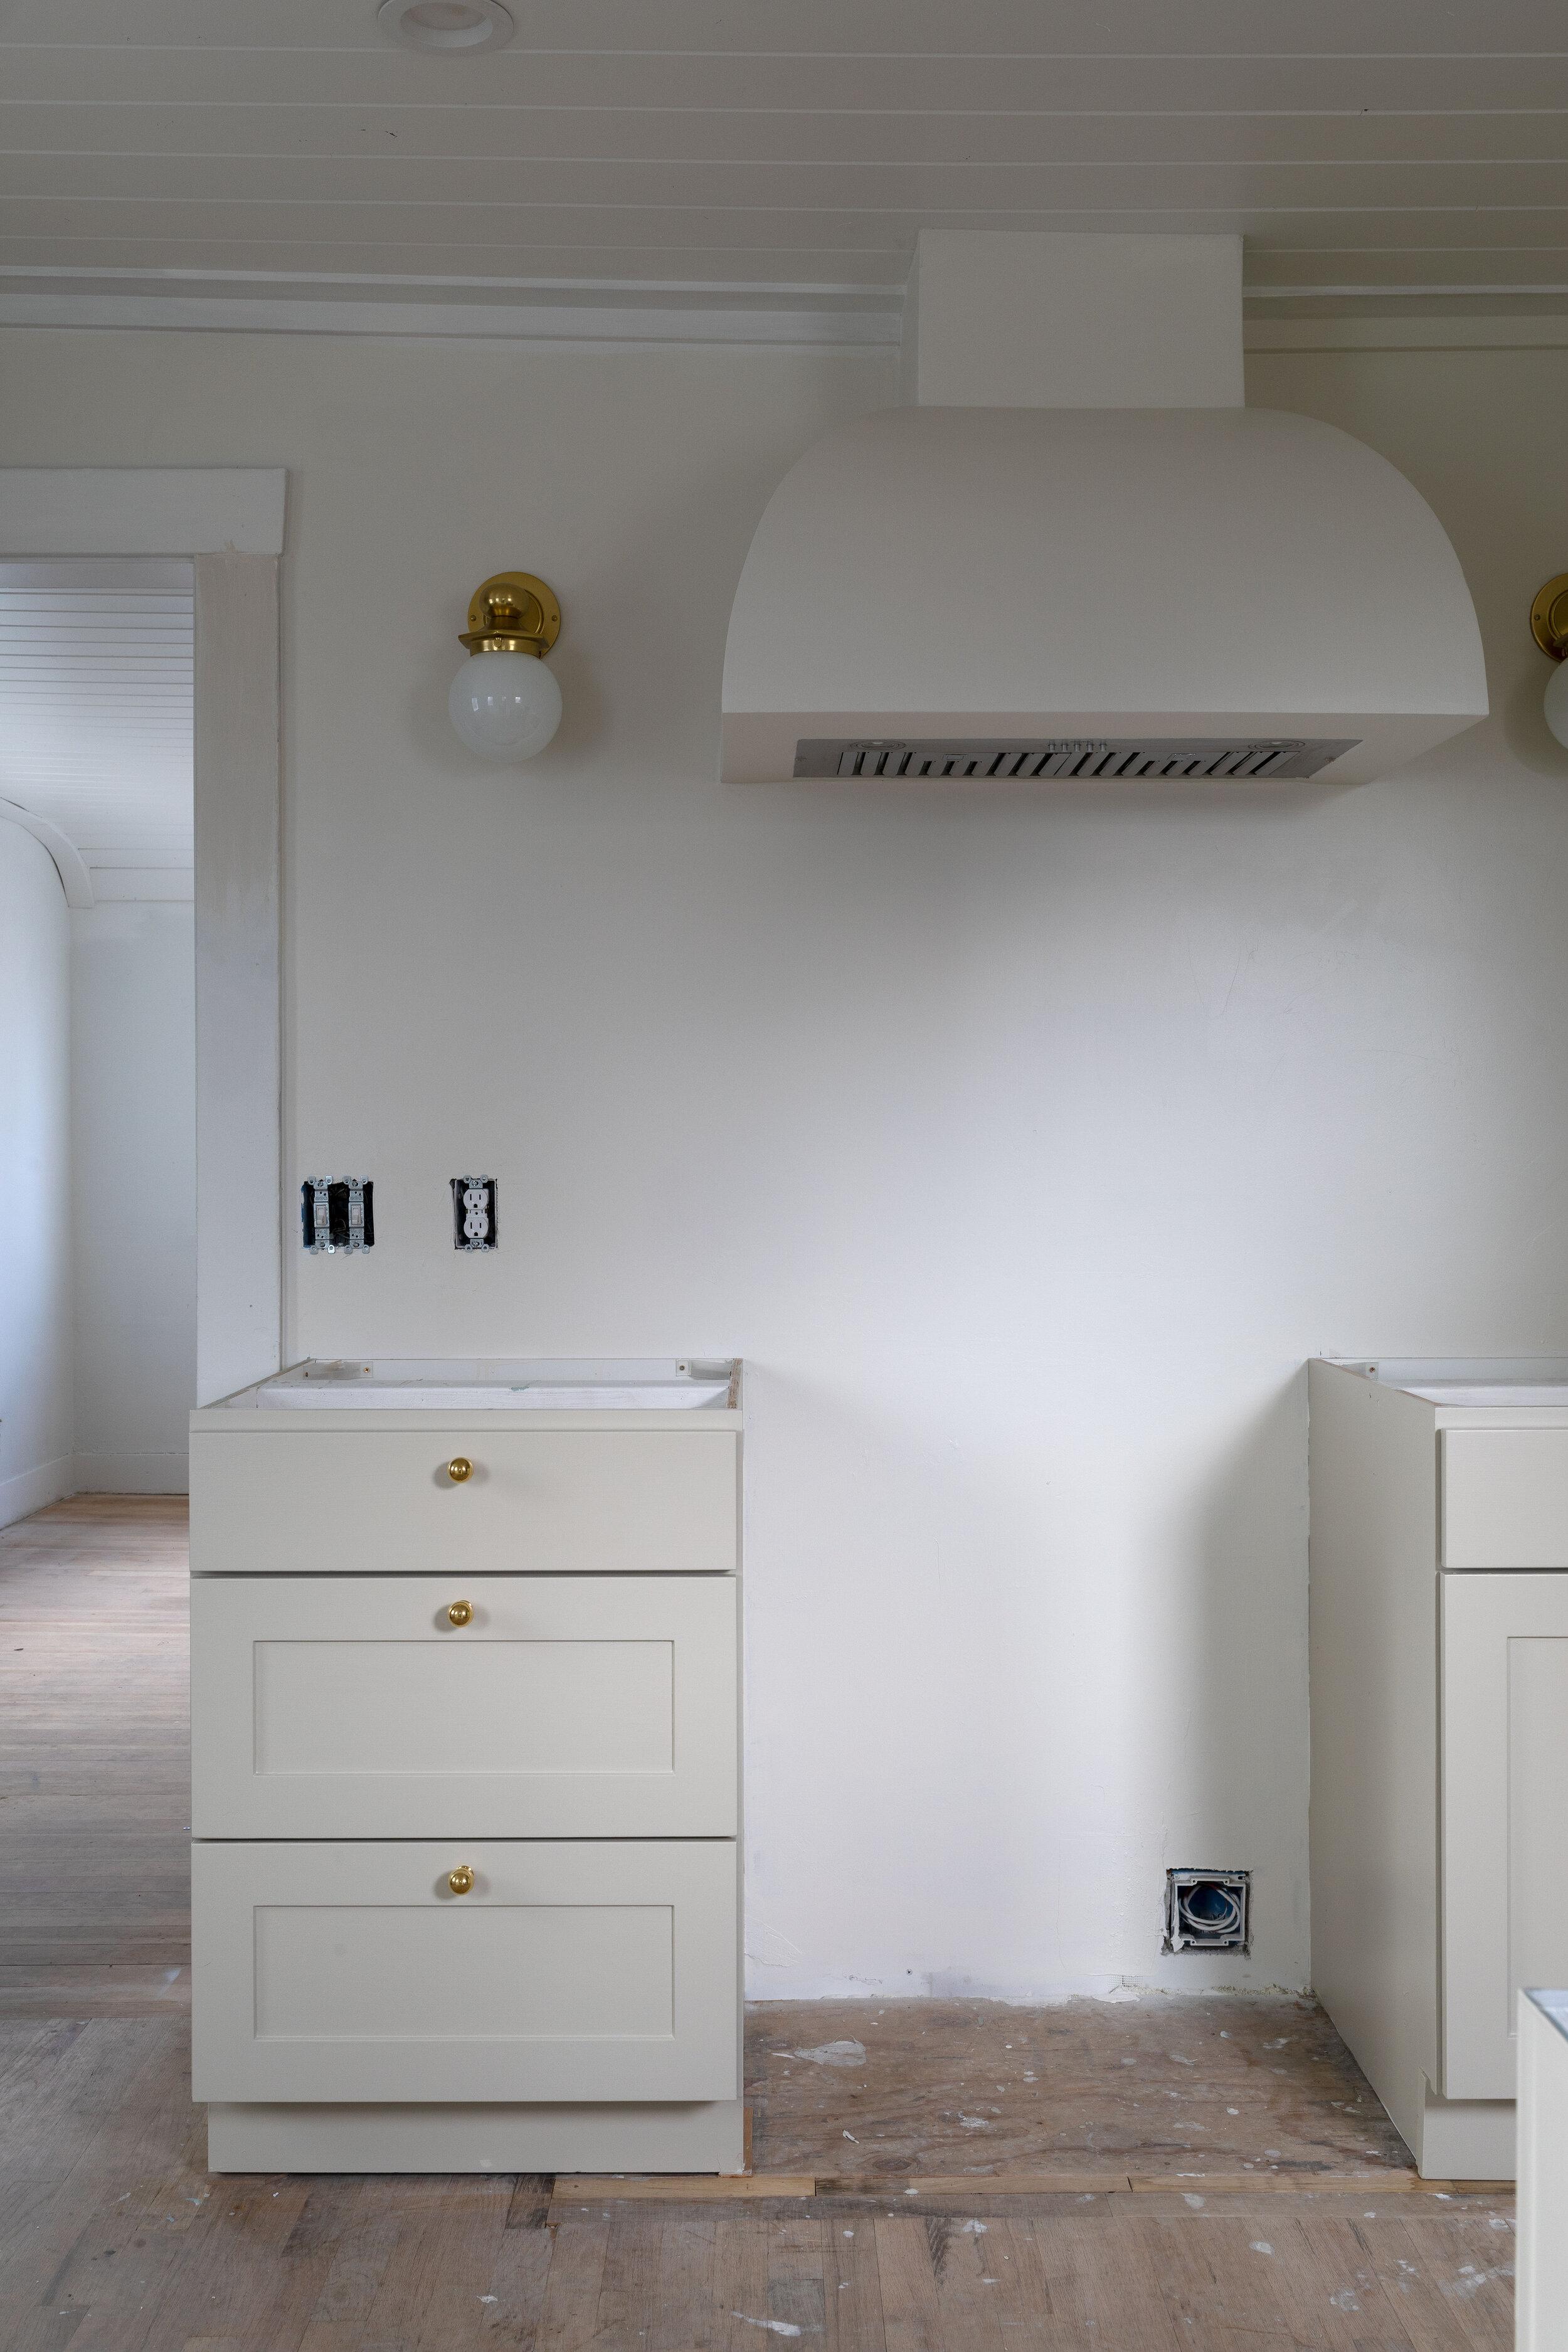 how we customized basic stock cabinets for the Poplar Cottage kitchen on www.thegritandpolish.com